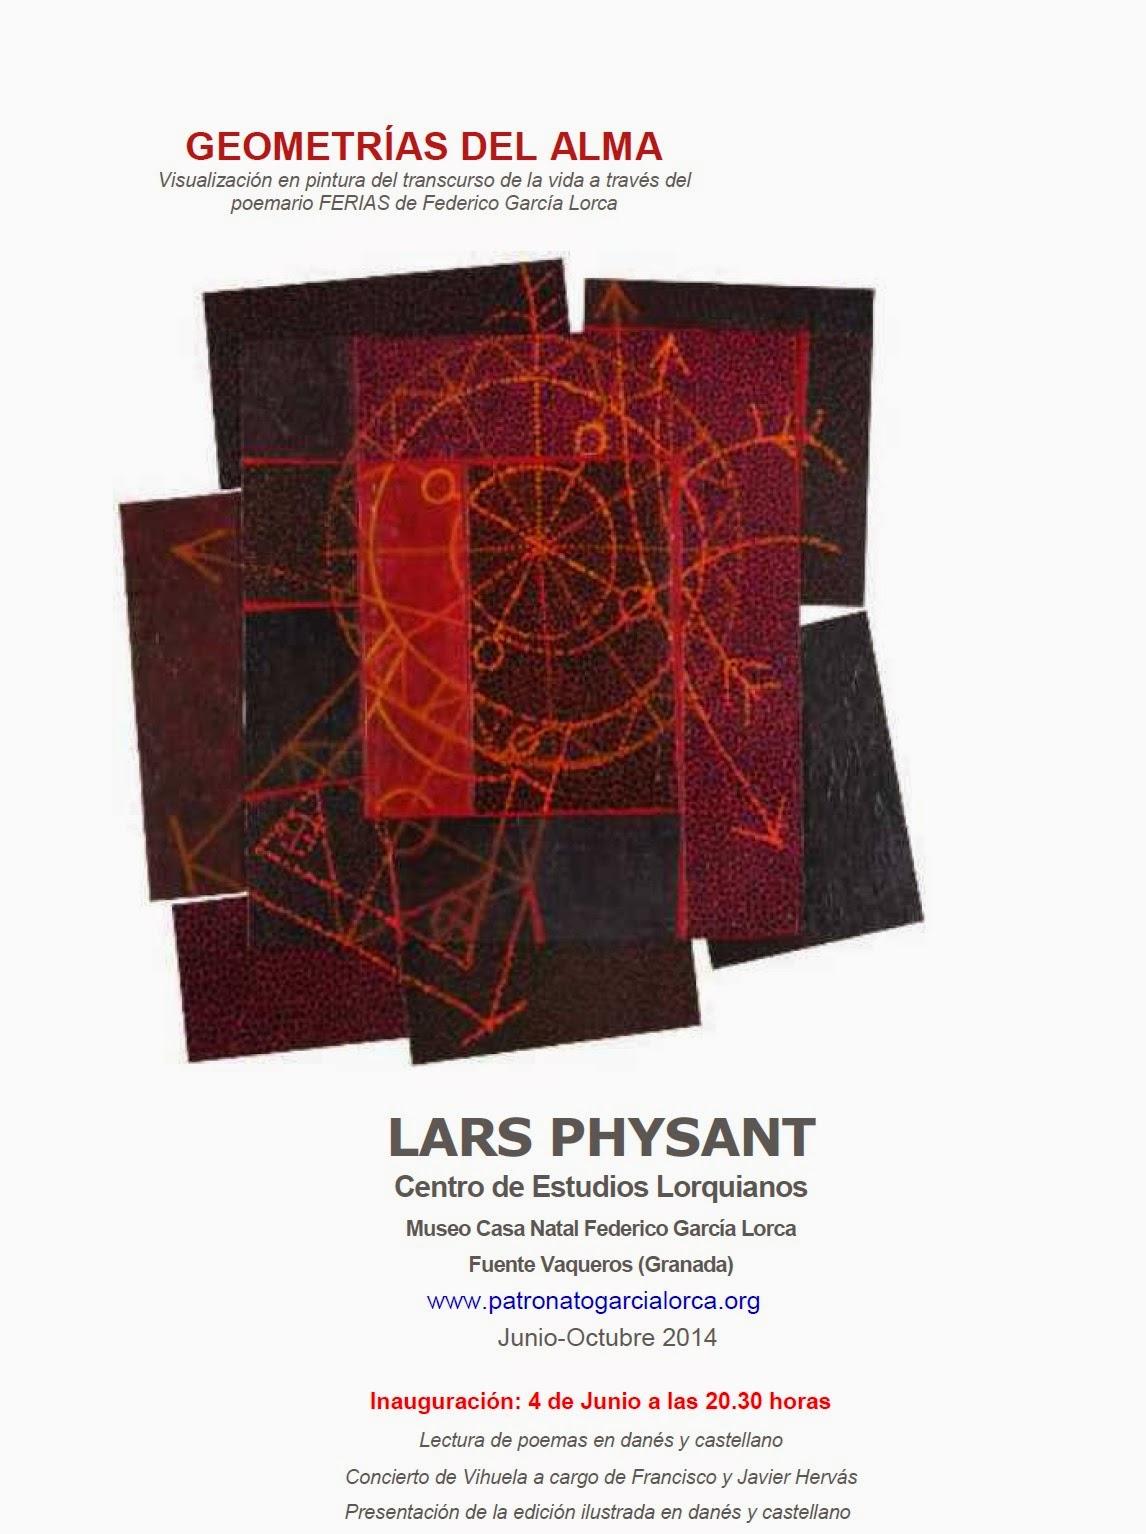 LaraPhysantGeometriasDelAlma_Mayo2014_